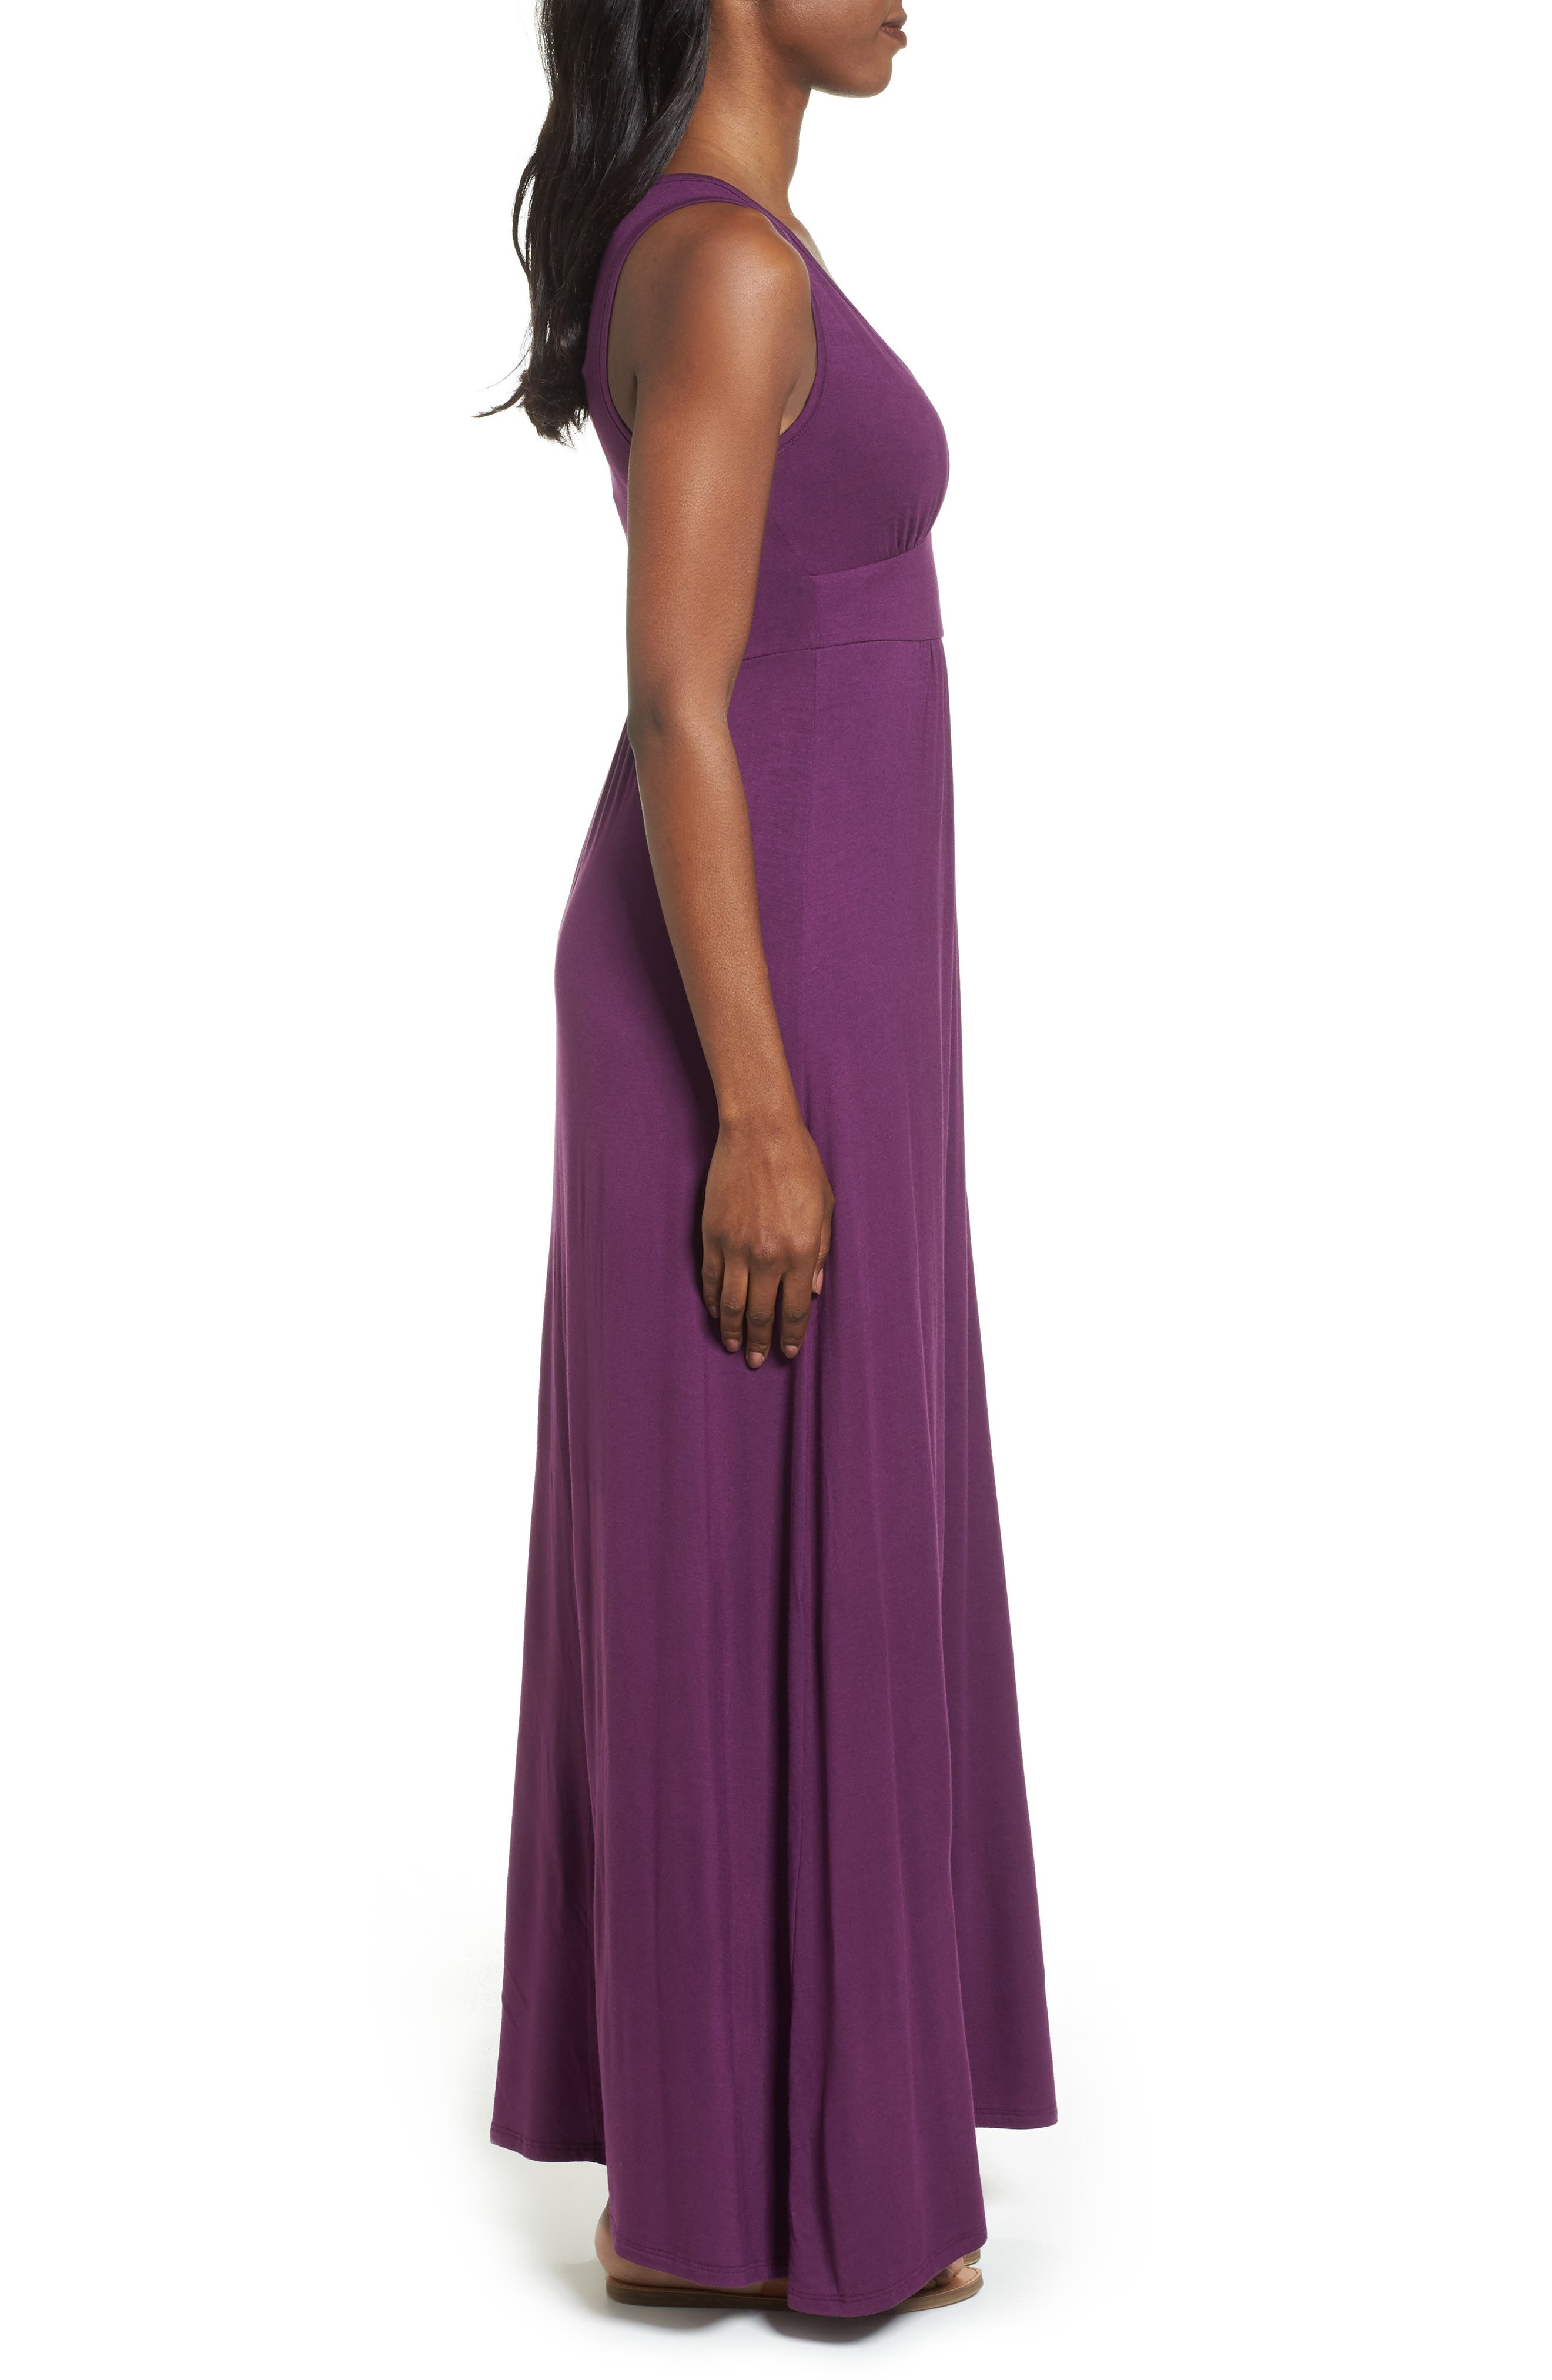 LOVEAPPELLA, V-Neck Jersey Maxi Dress, Alternate thumbnail 4, color, PURPLE DARK